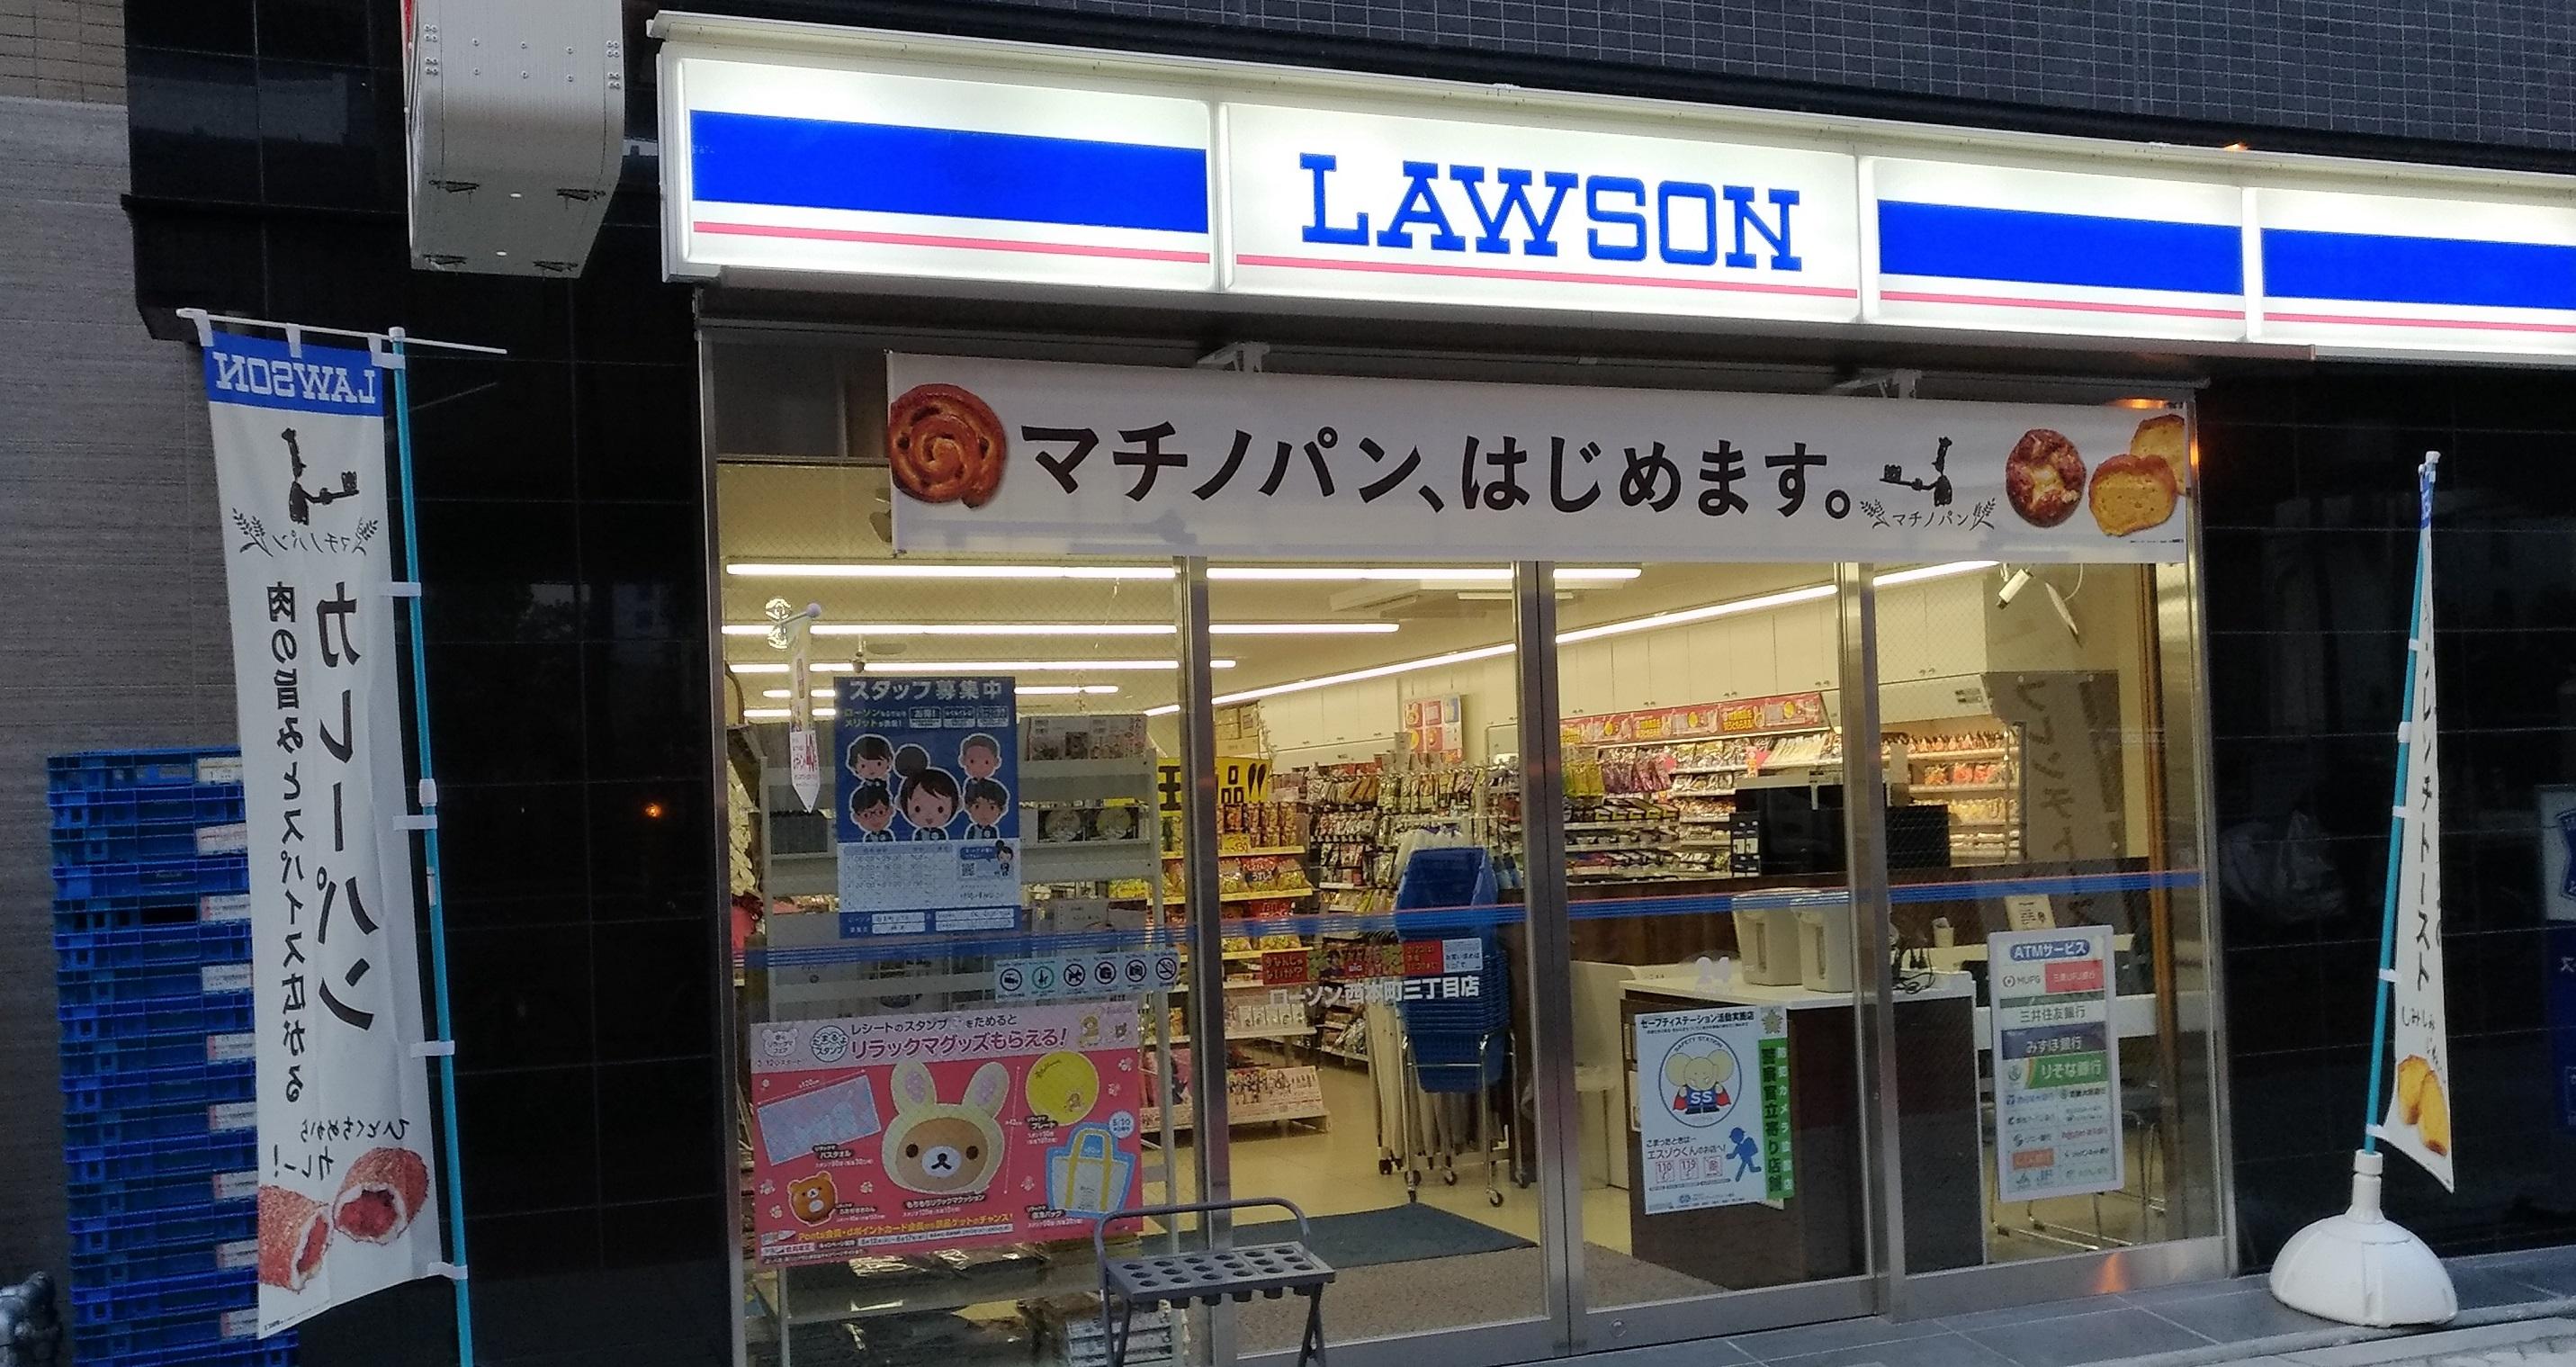 osaka_lawson_nishi_honmachi_convini_.jpg